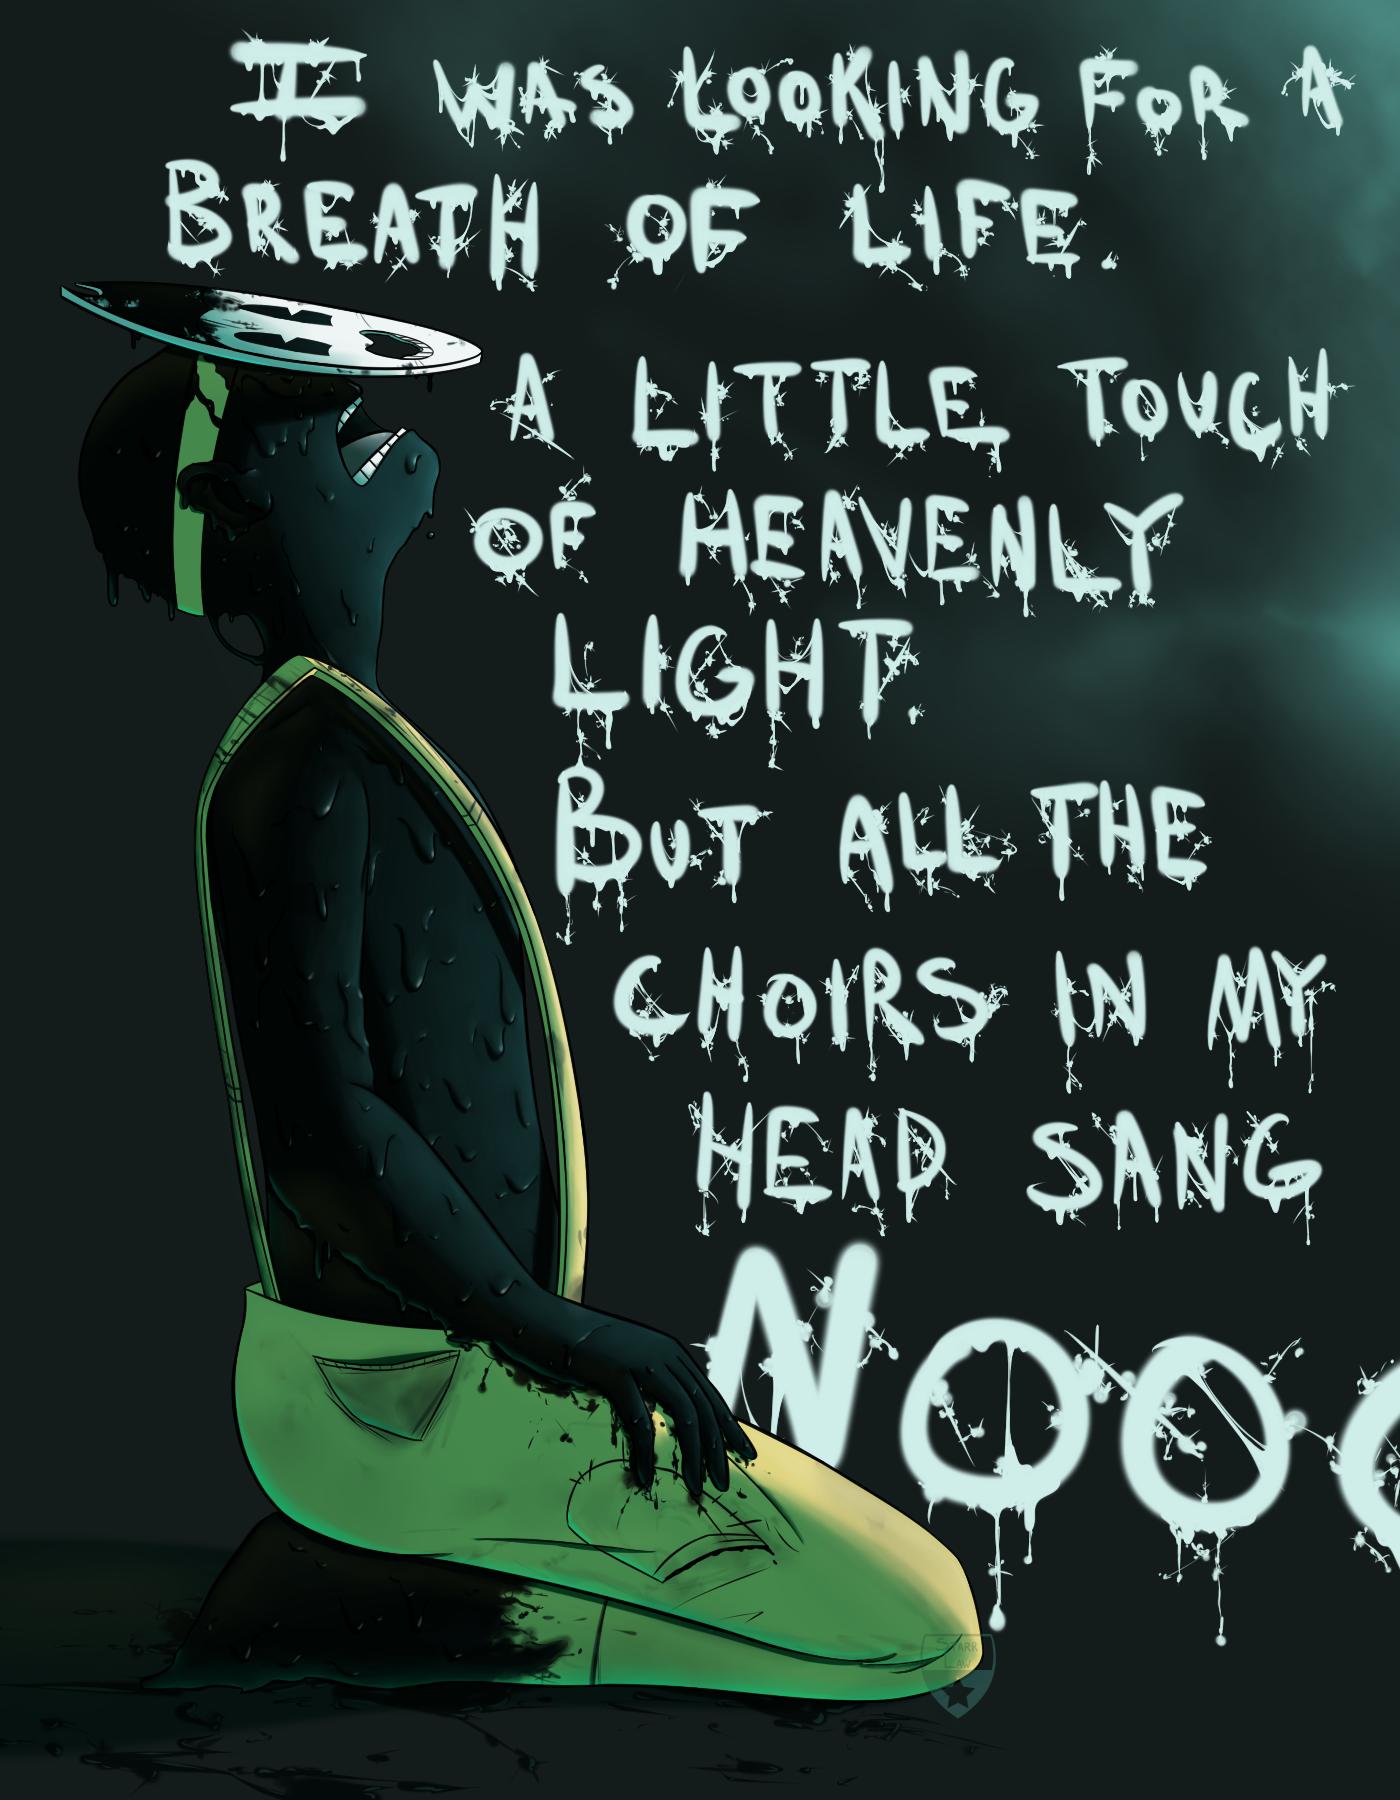 florence and the machine breath of lyrics